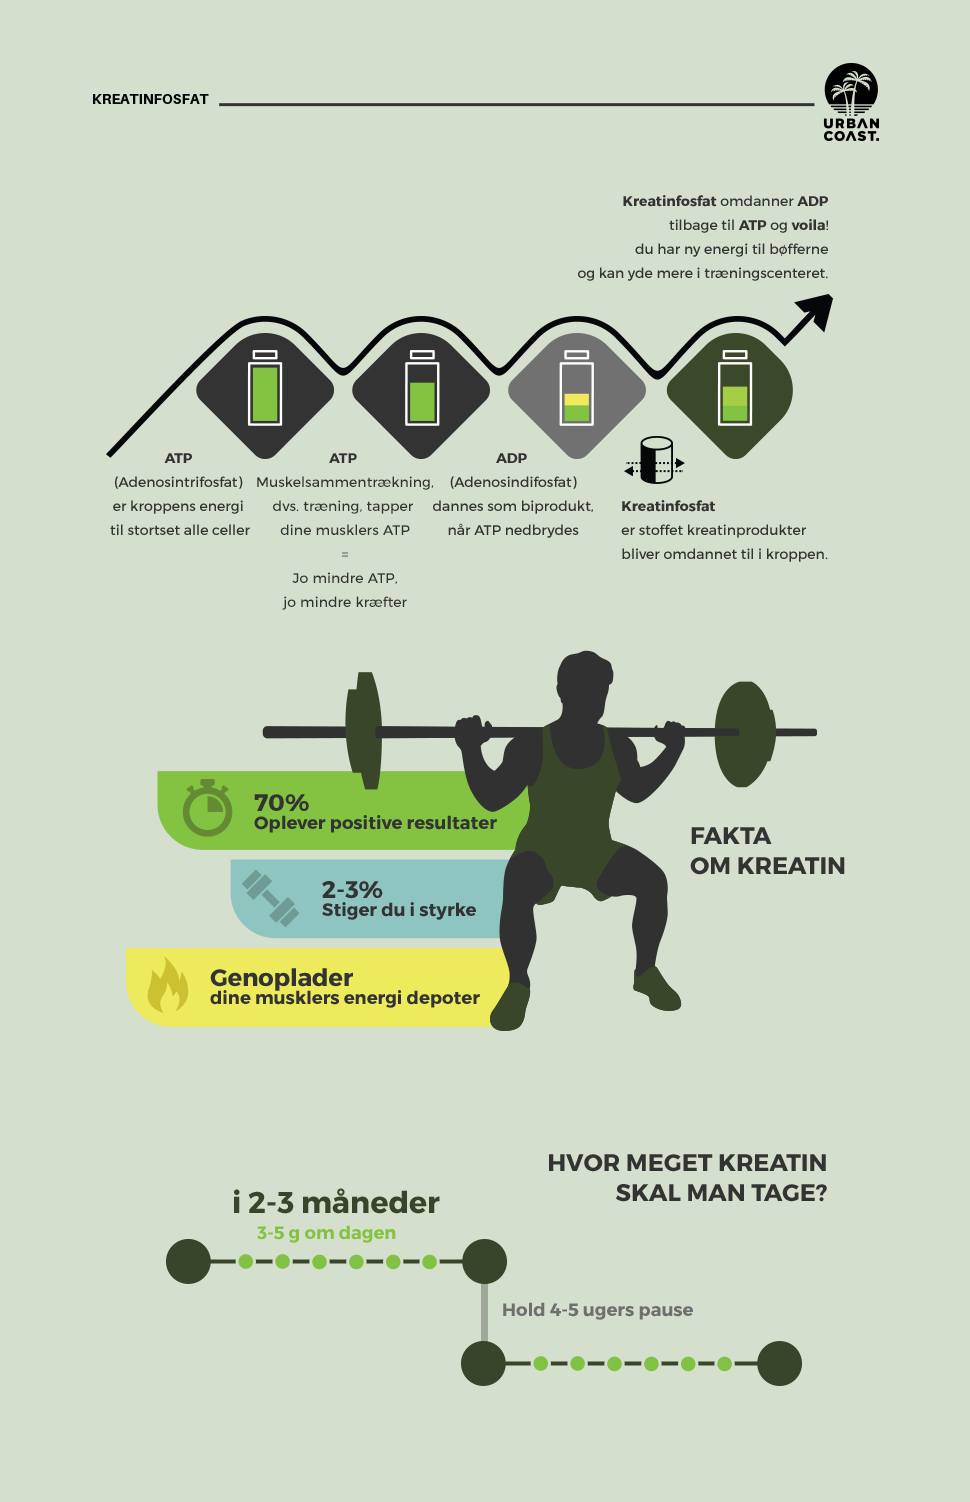 kreatin infografik urbancoast.dk